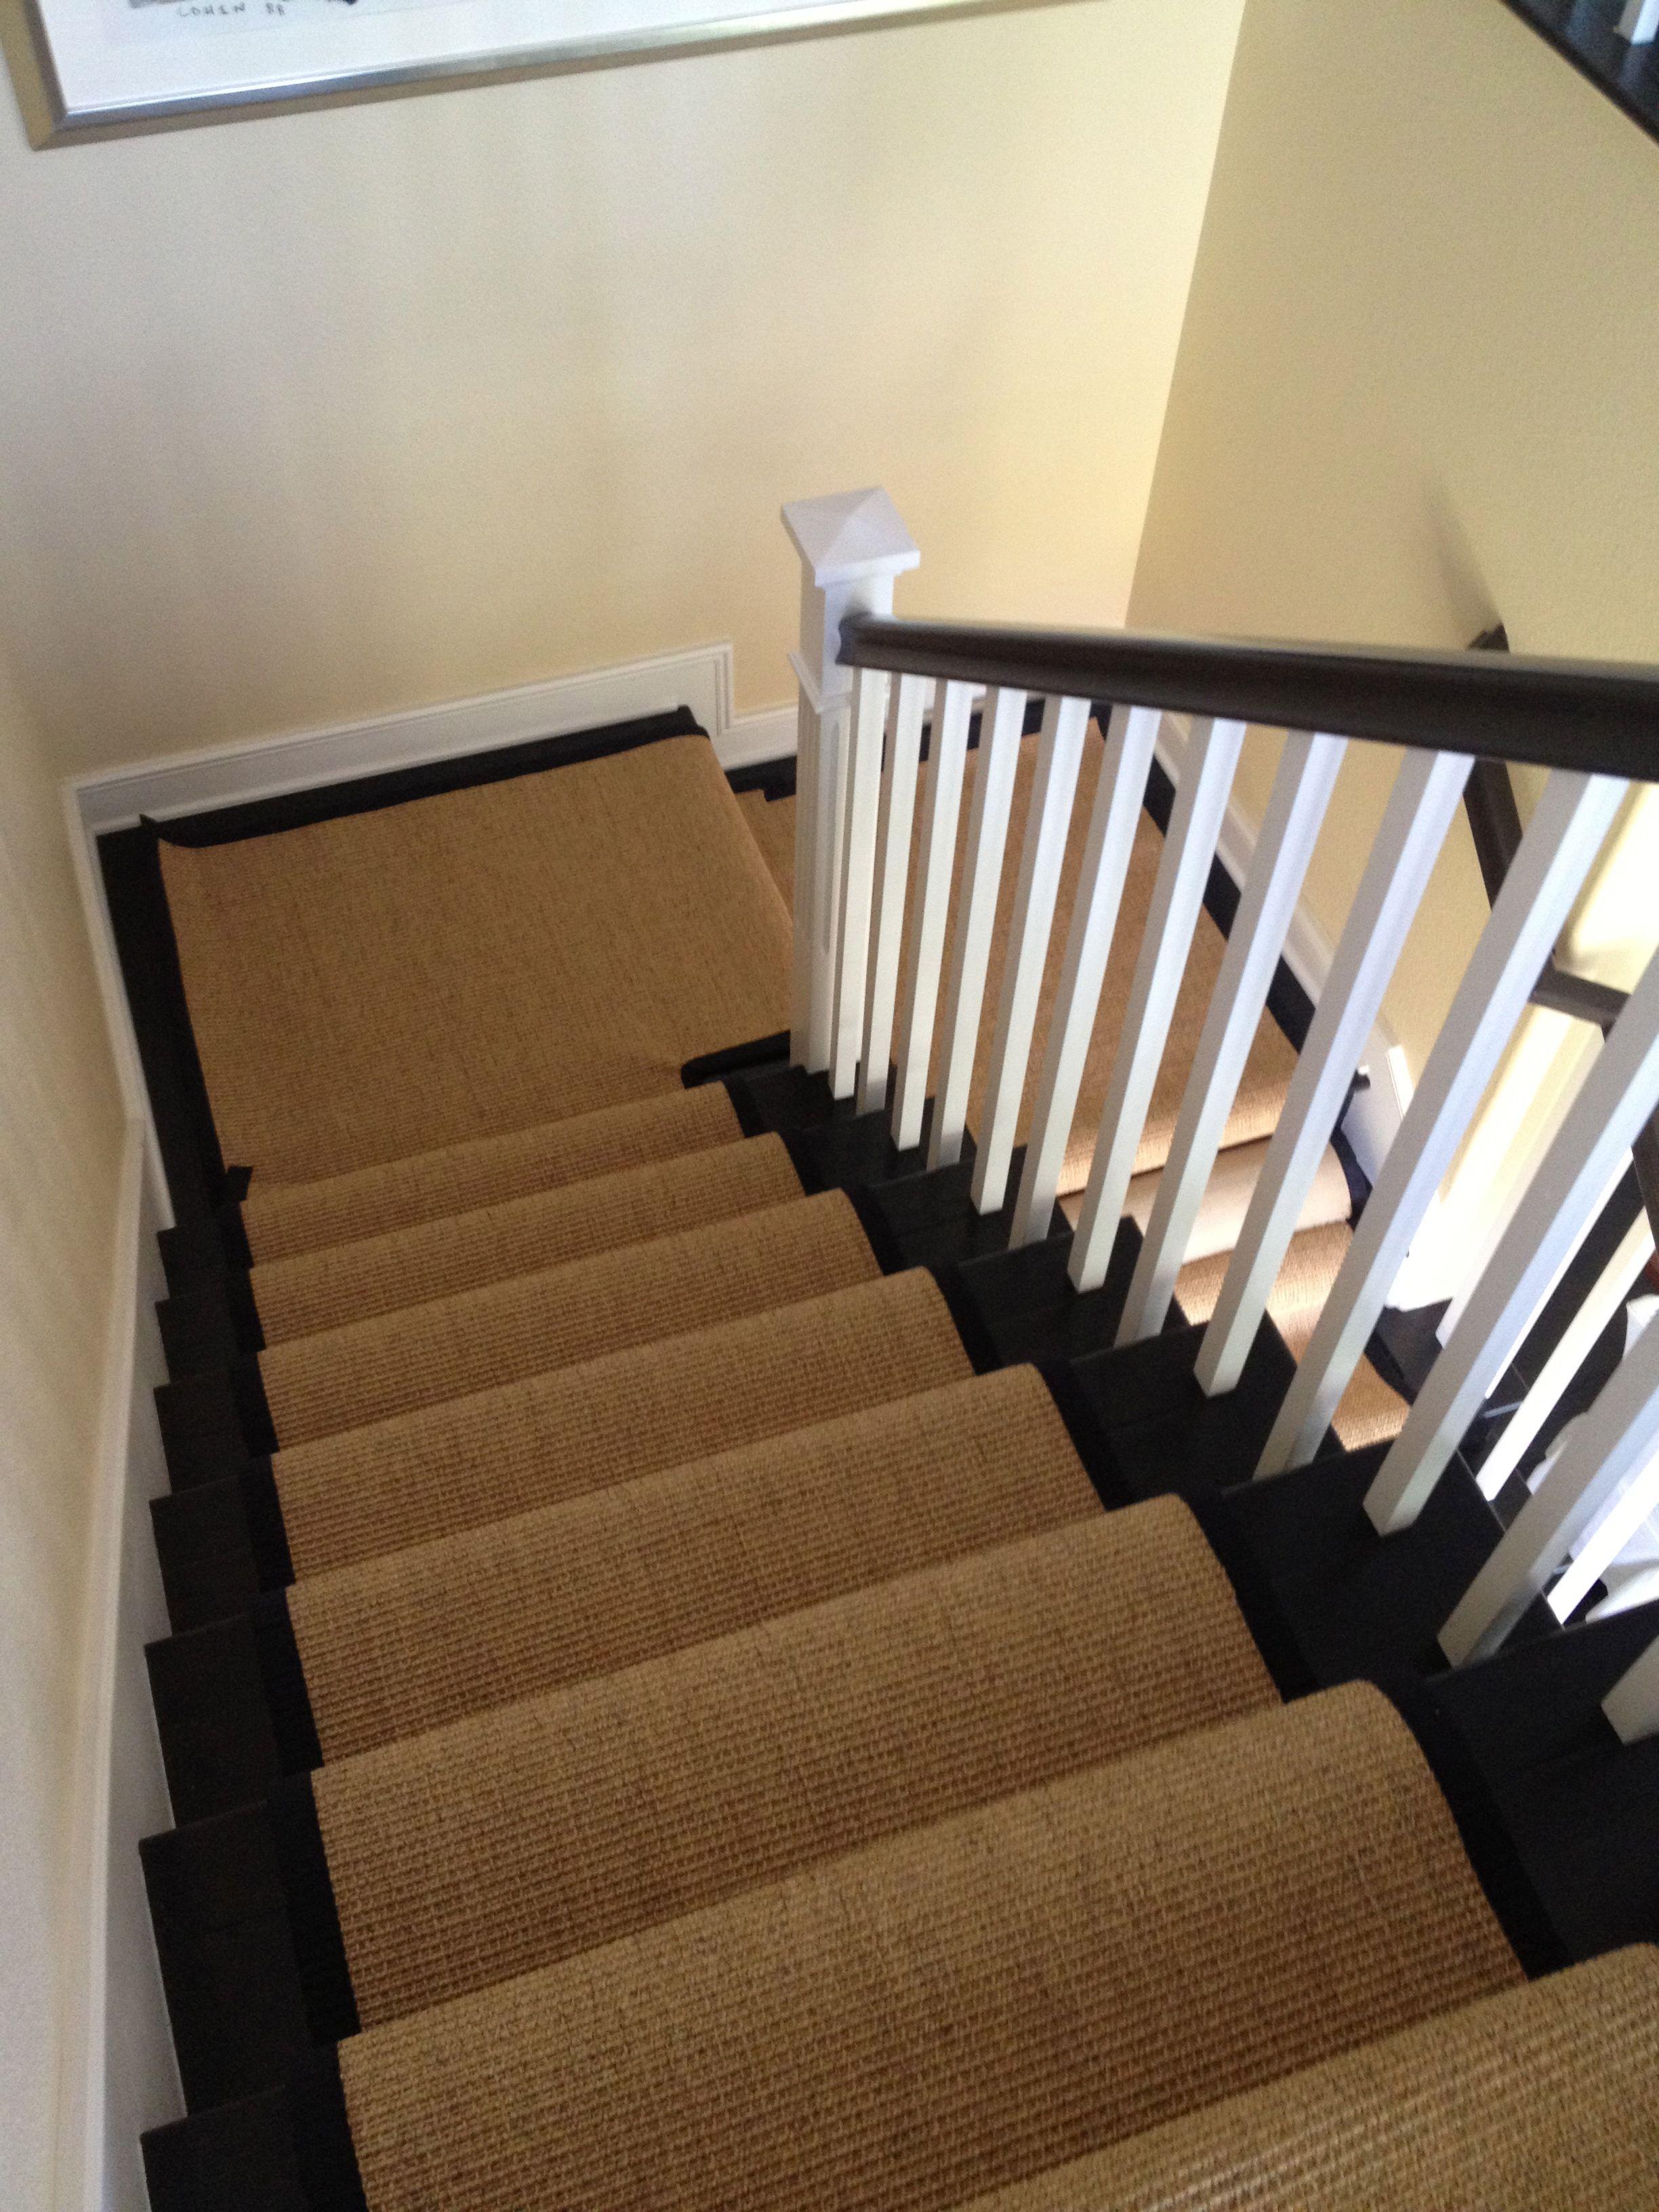 Best Stair Sisal Runner With Black Border The Good Home 400 x 300